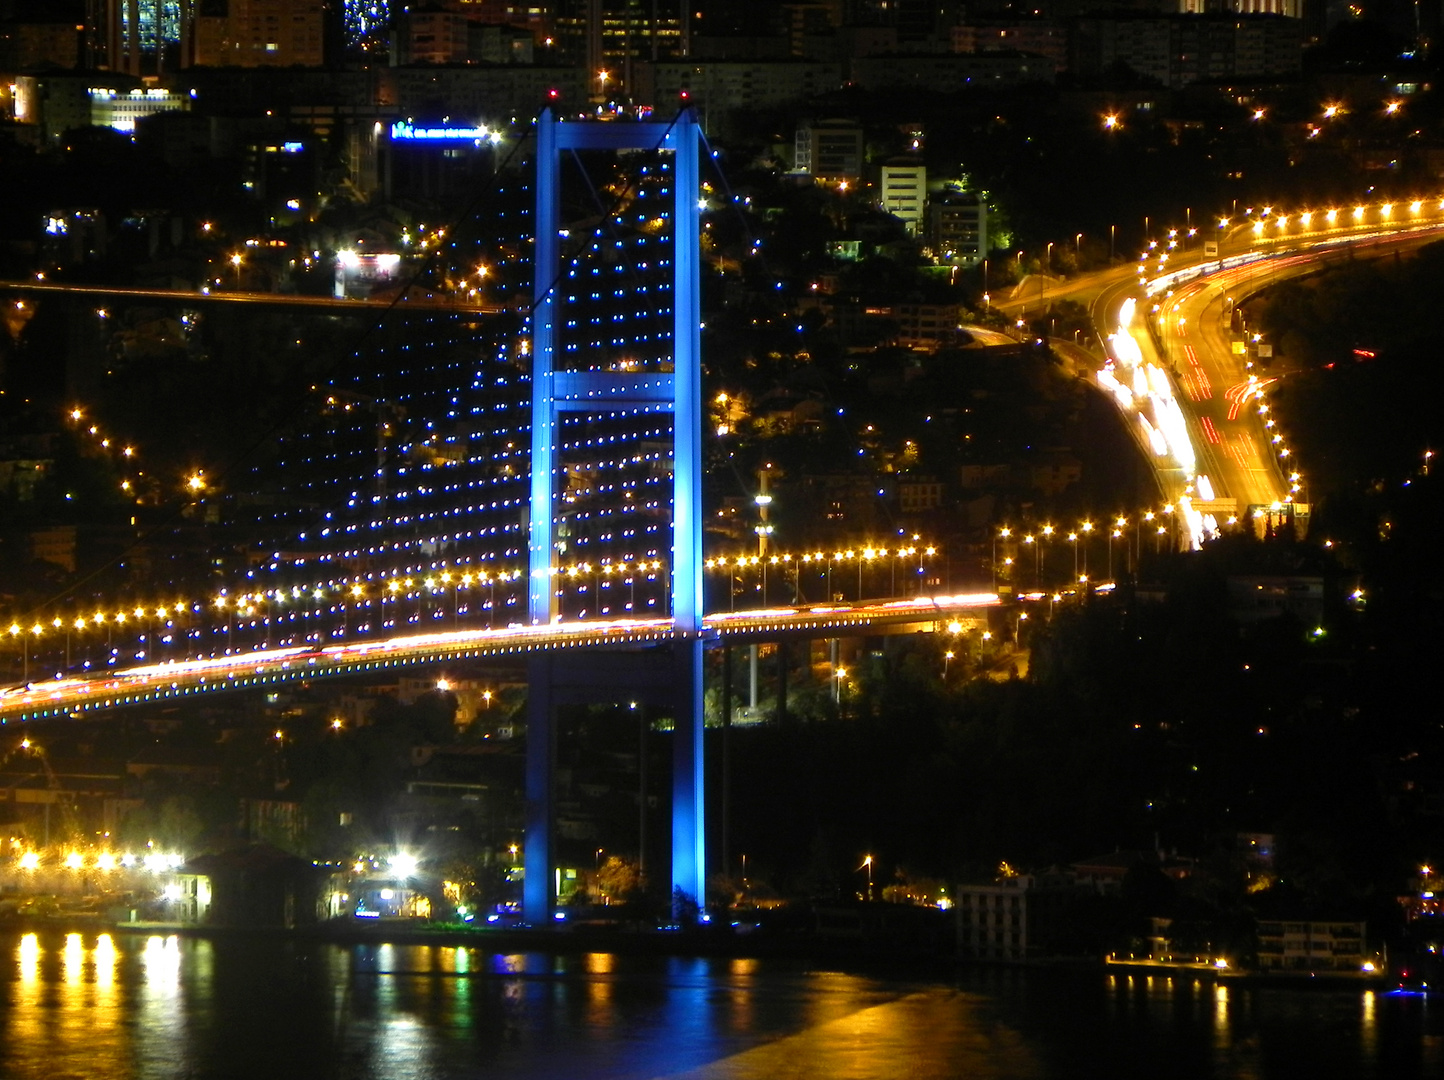 Blaue Bosporusbrücke